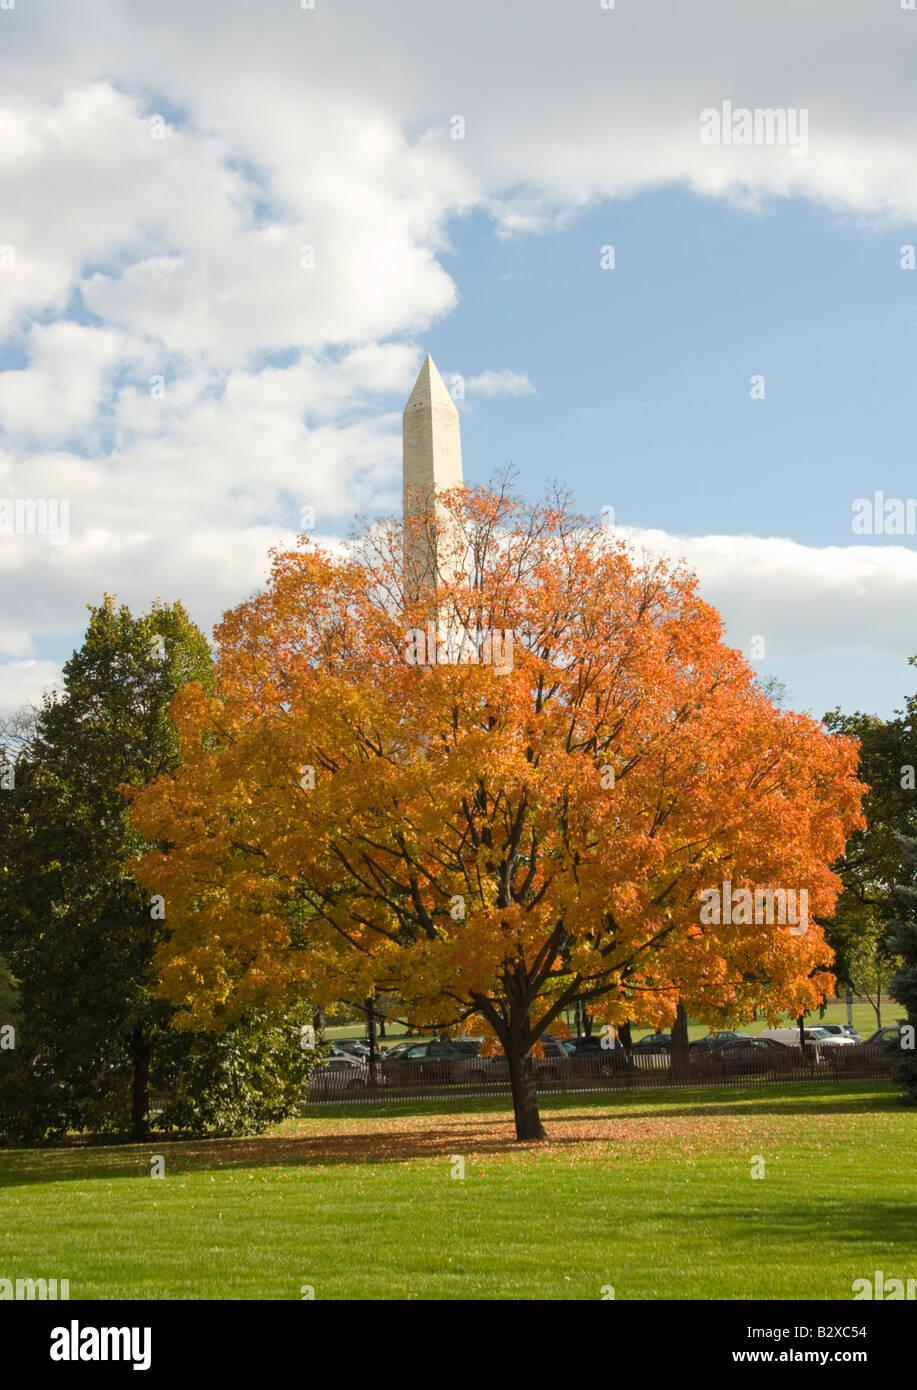 Washington DC USA The Washington Monument and Fall Color near the White House Photo copyright Lee Foster Photo 2 - Stock Image